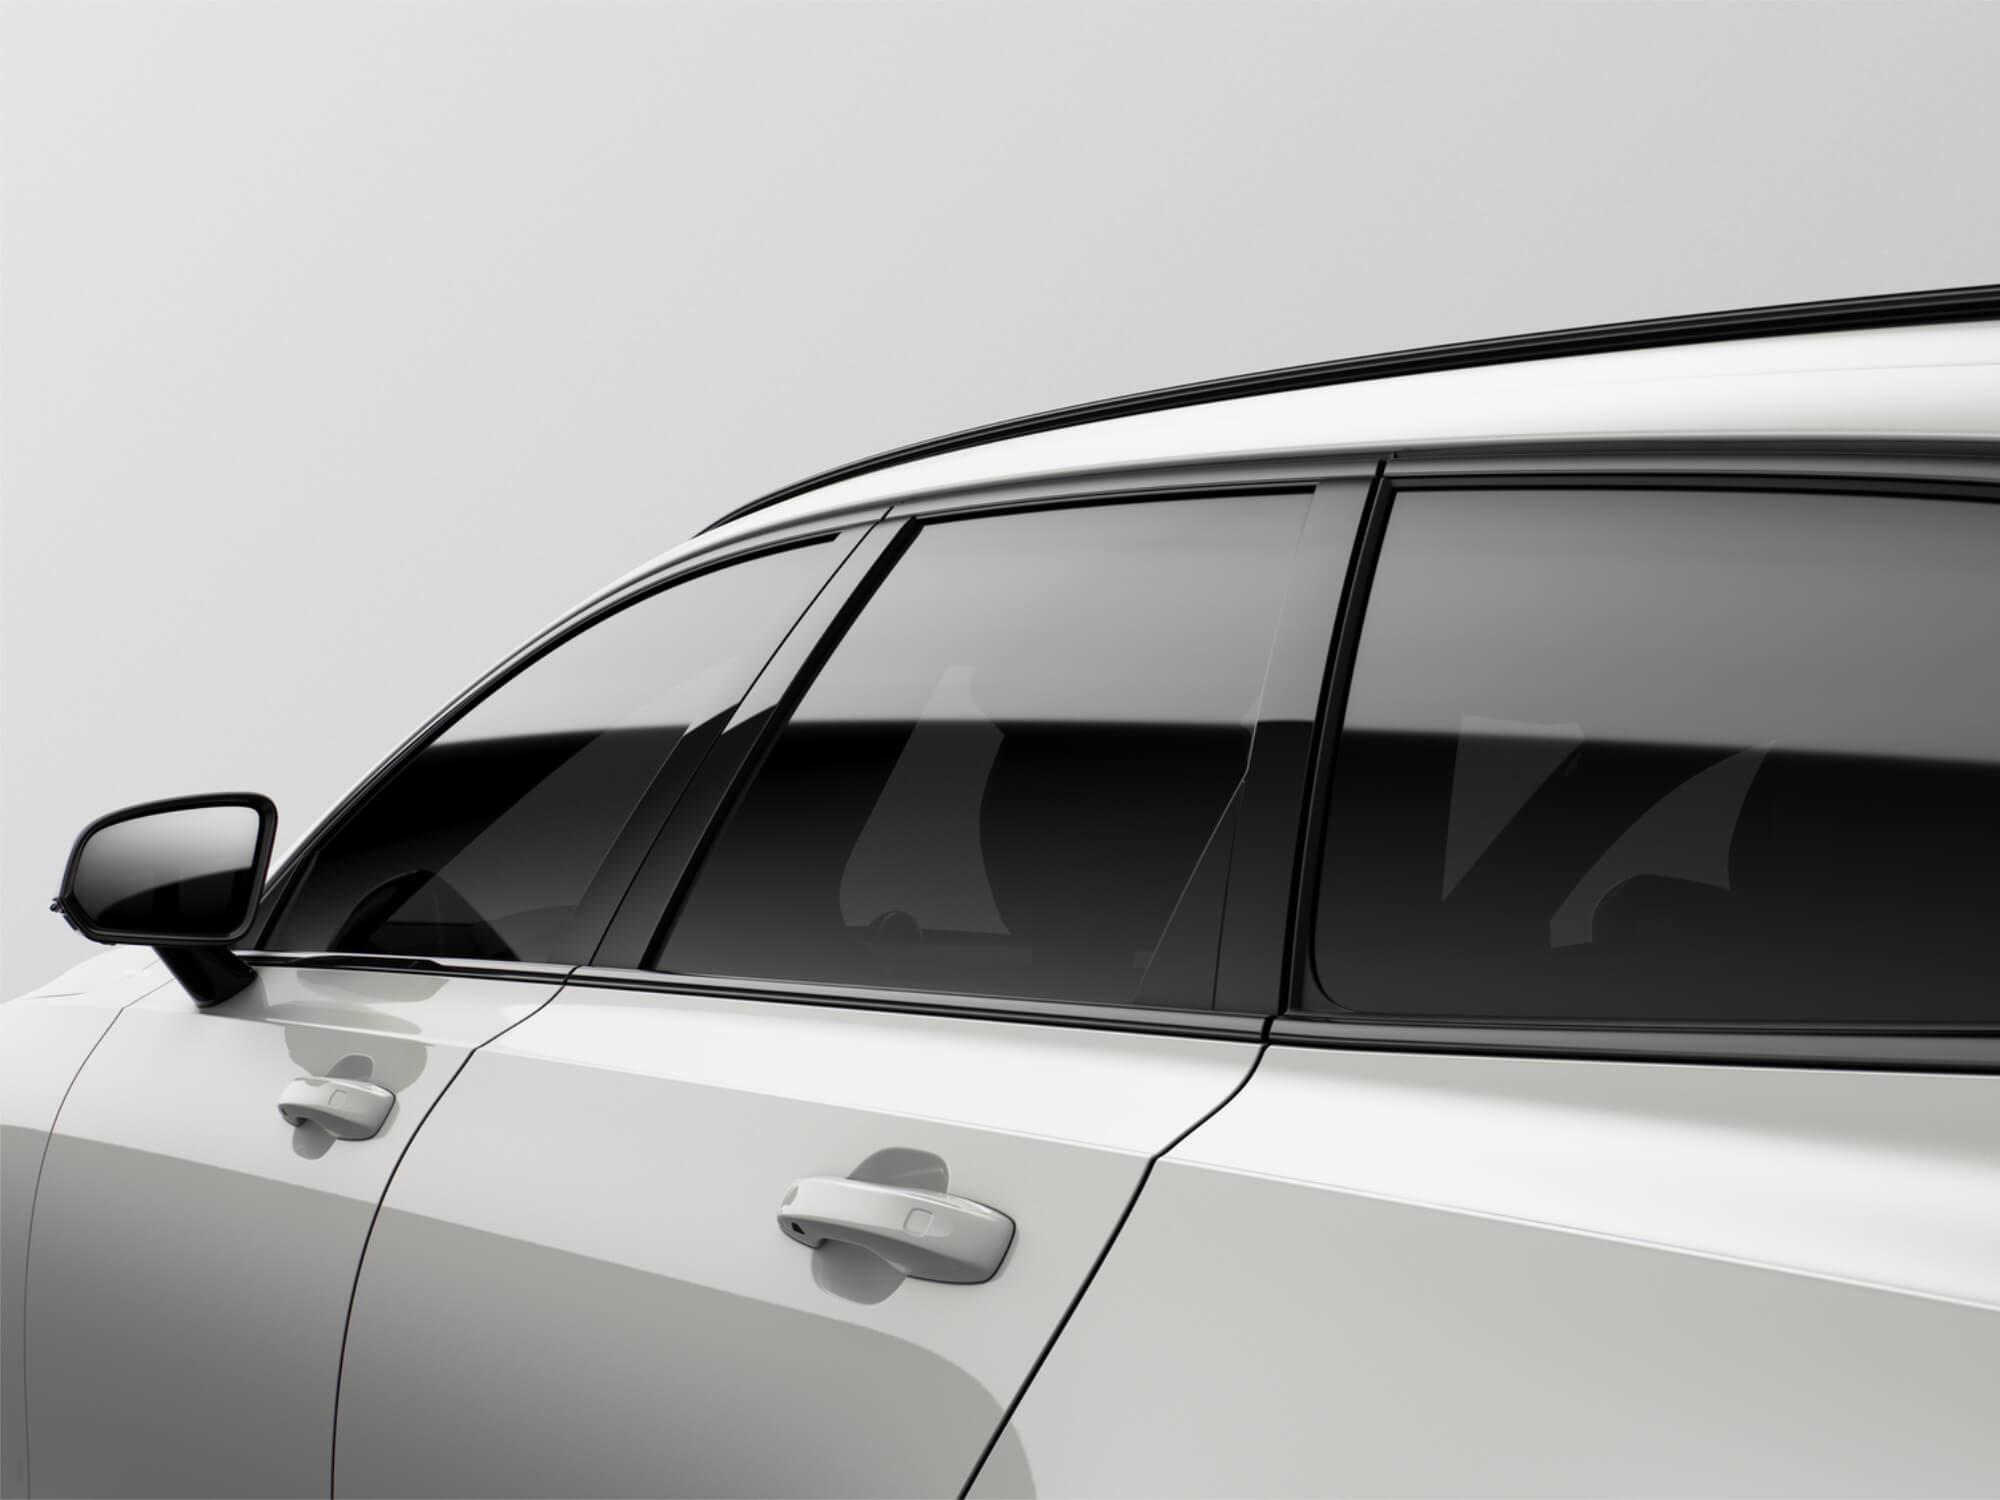 Volvo V90 Mild Hybrid zijkant detail